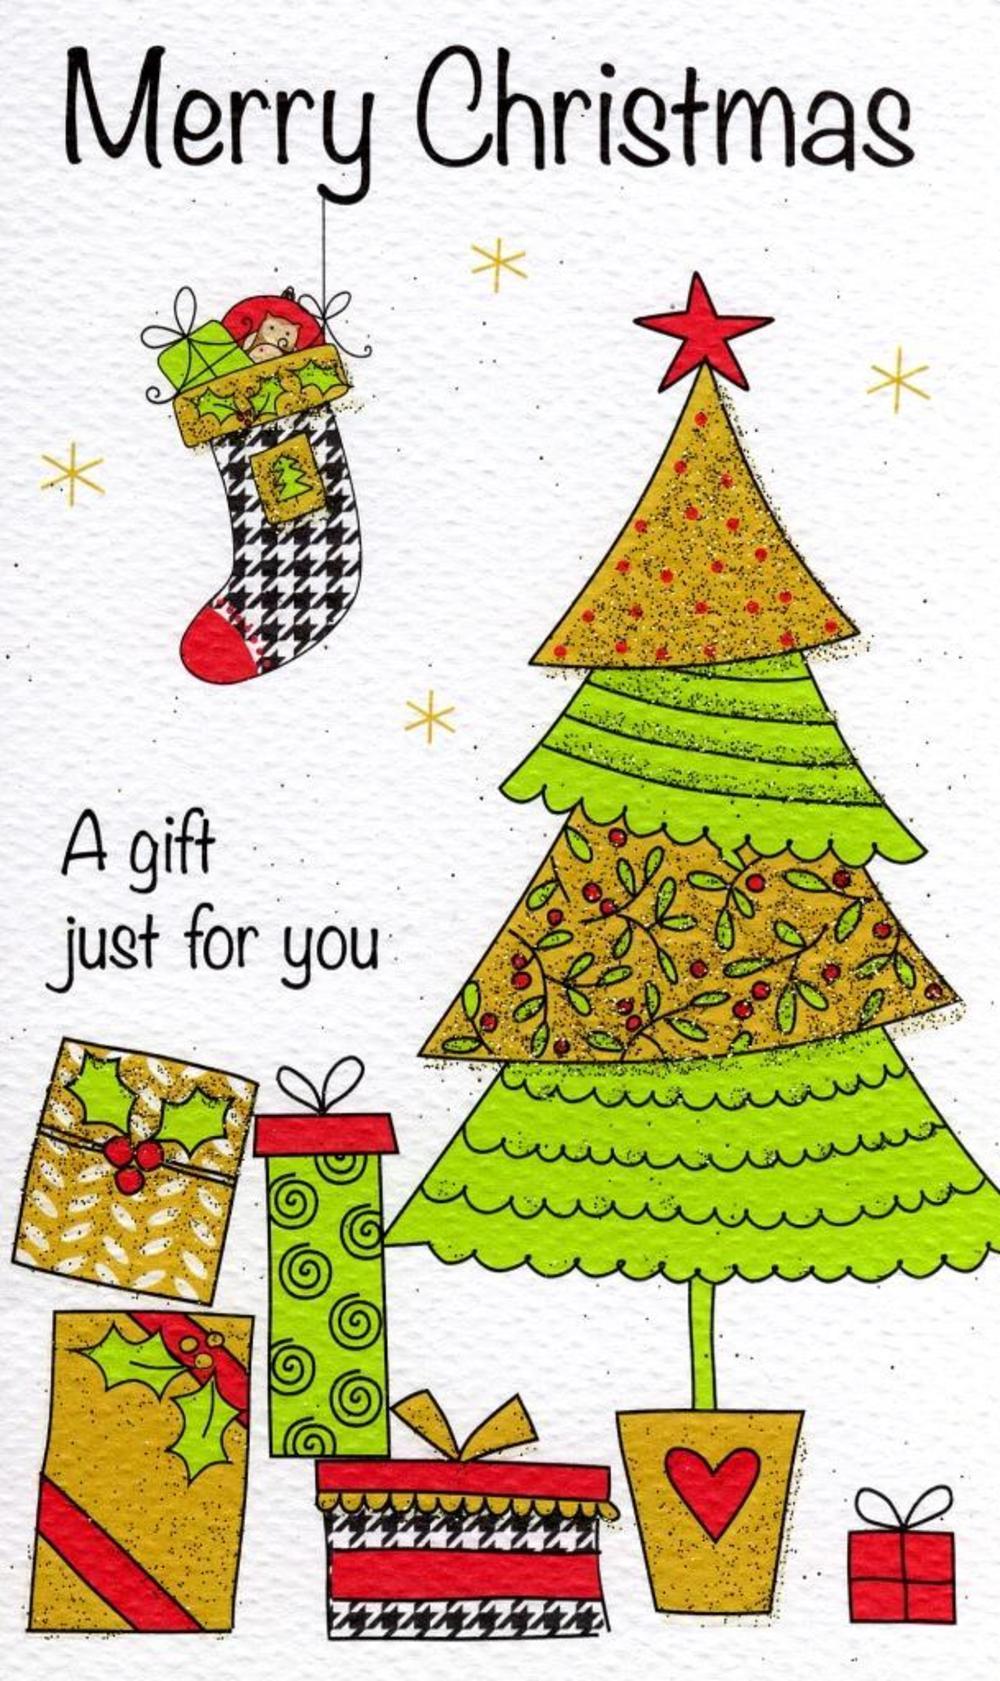 Merry Christmas Moneyholder Christmas Gift Card